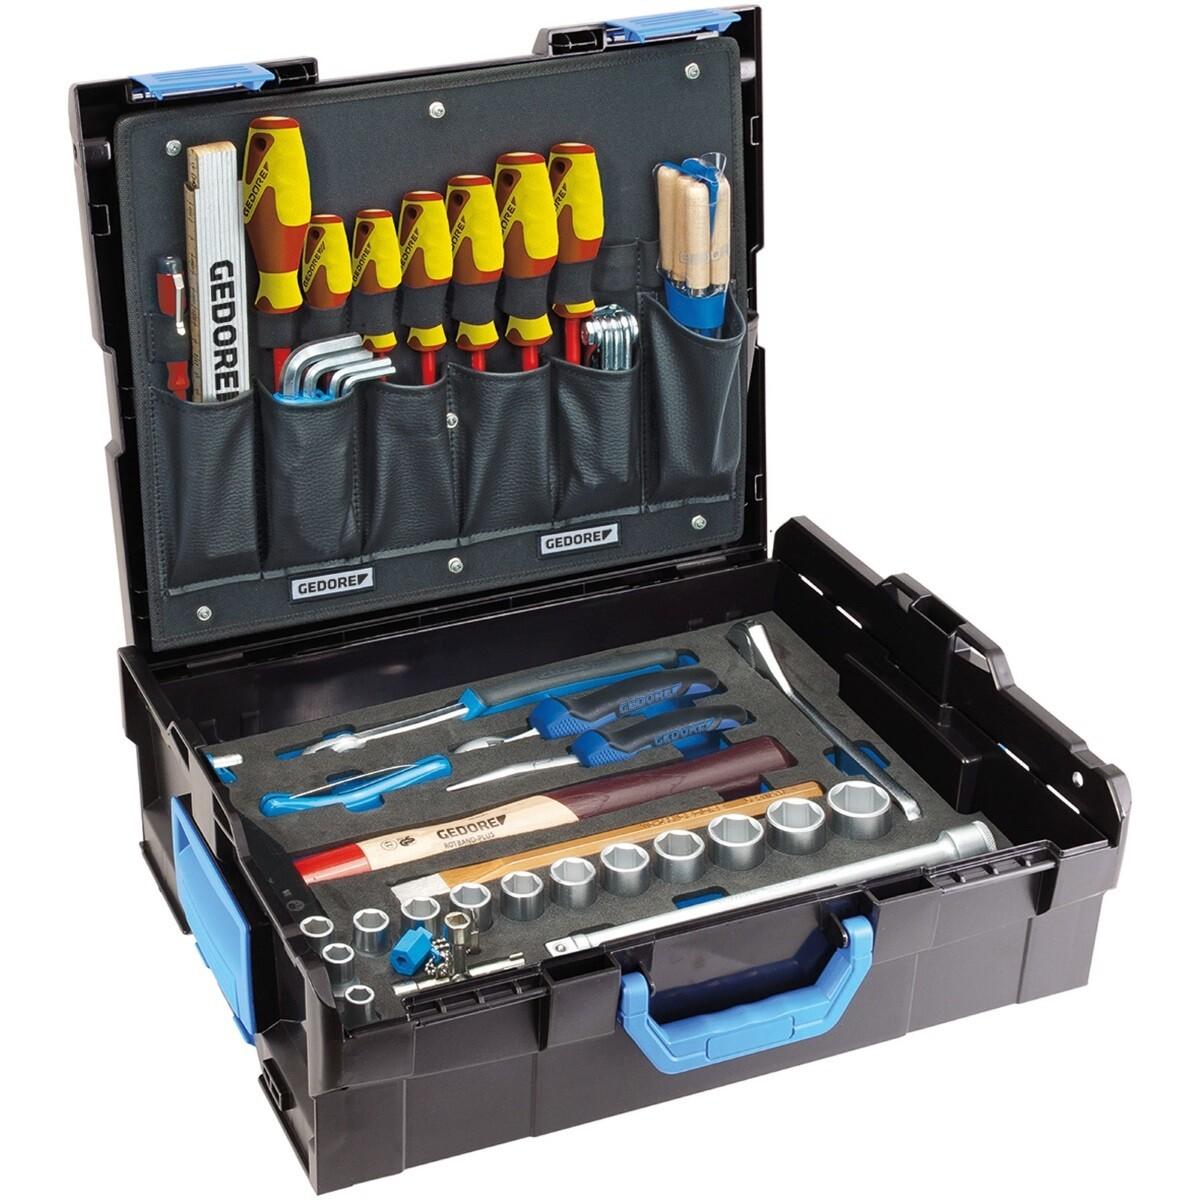 Gedore 2658194 58 Piece Sortimo Mechanics Tool Kit and L-Boxx 1100-01